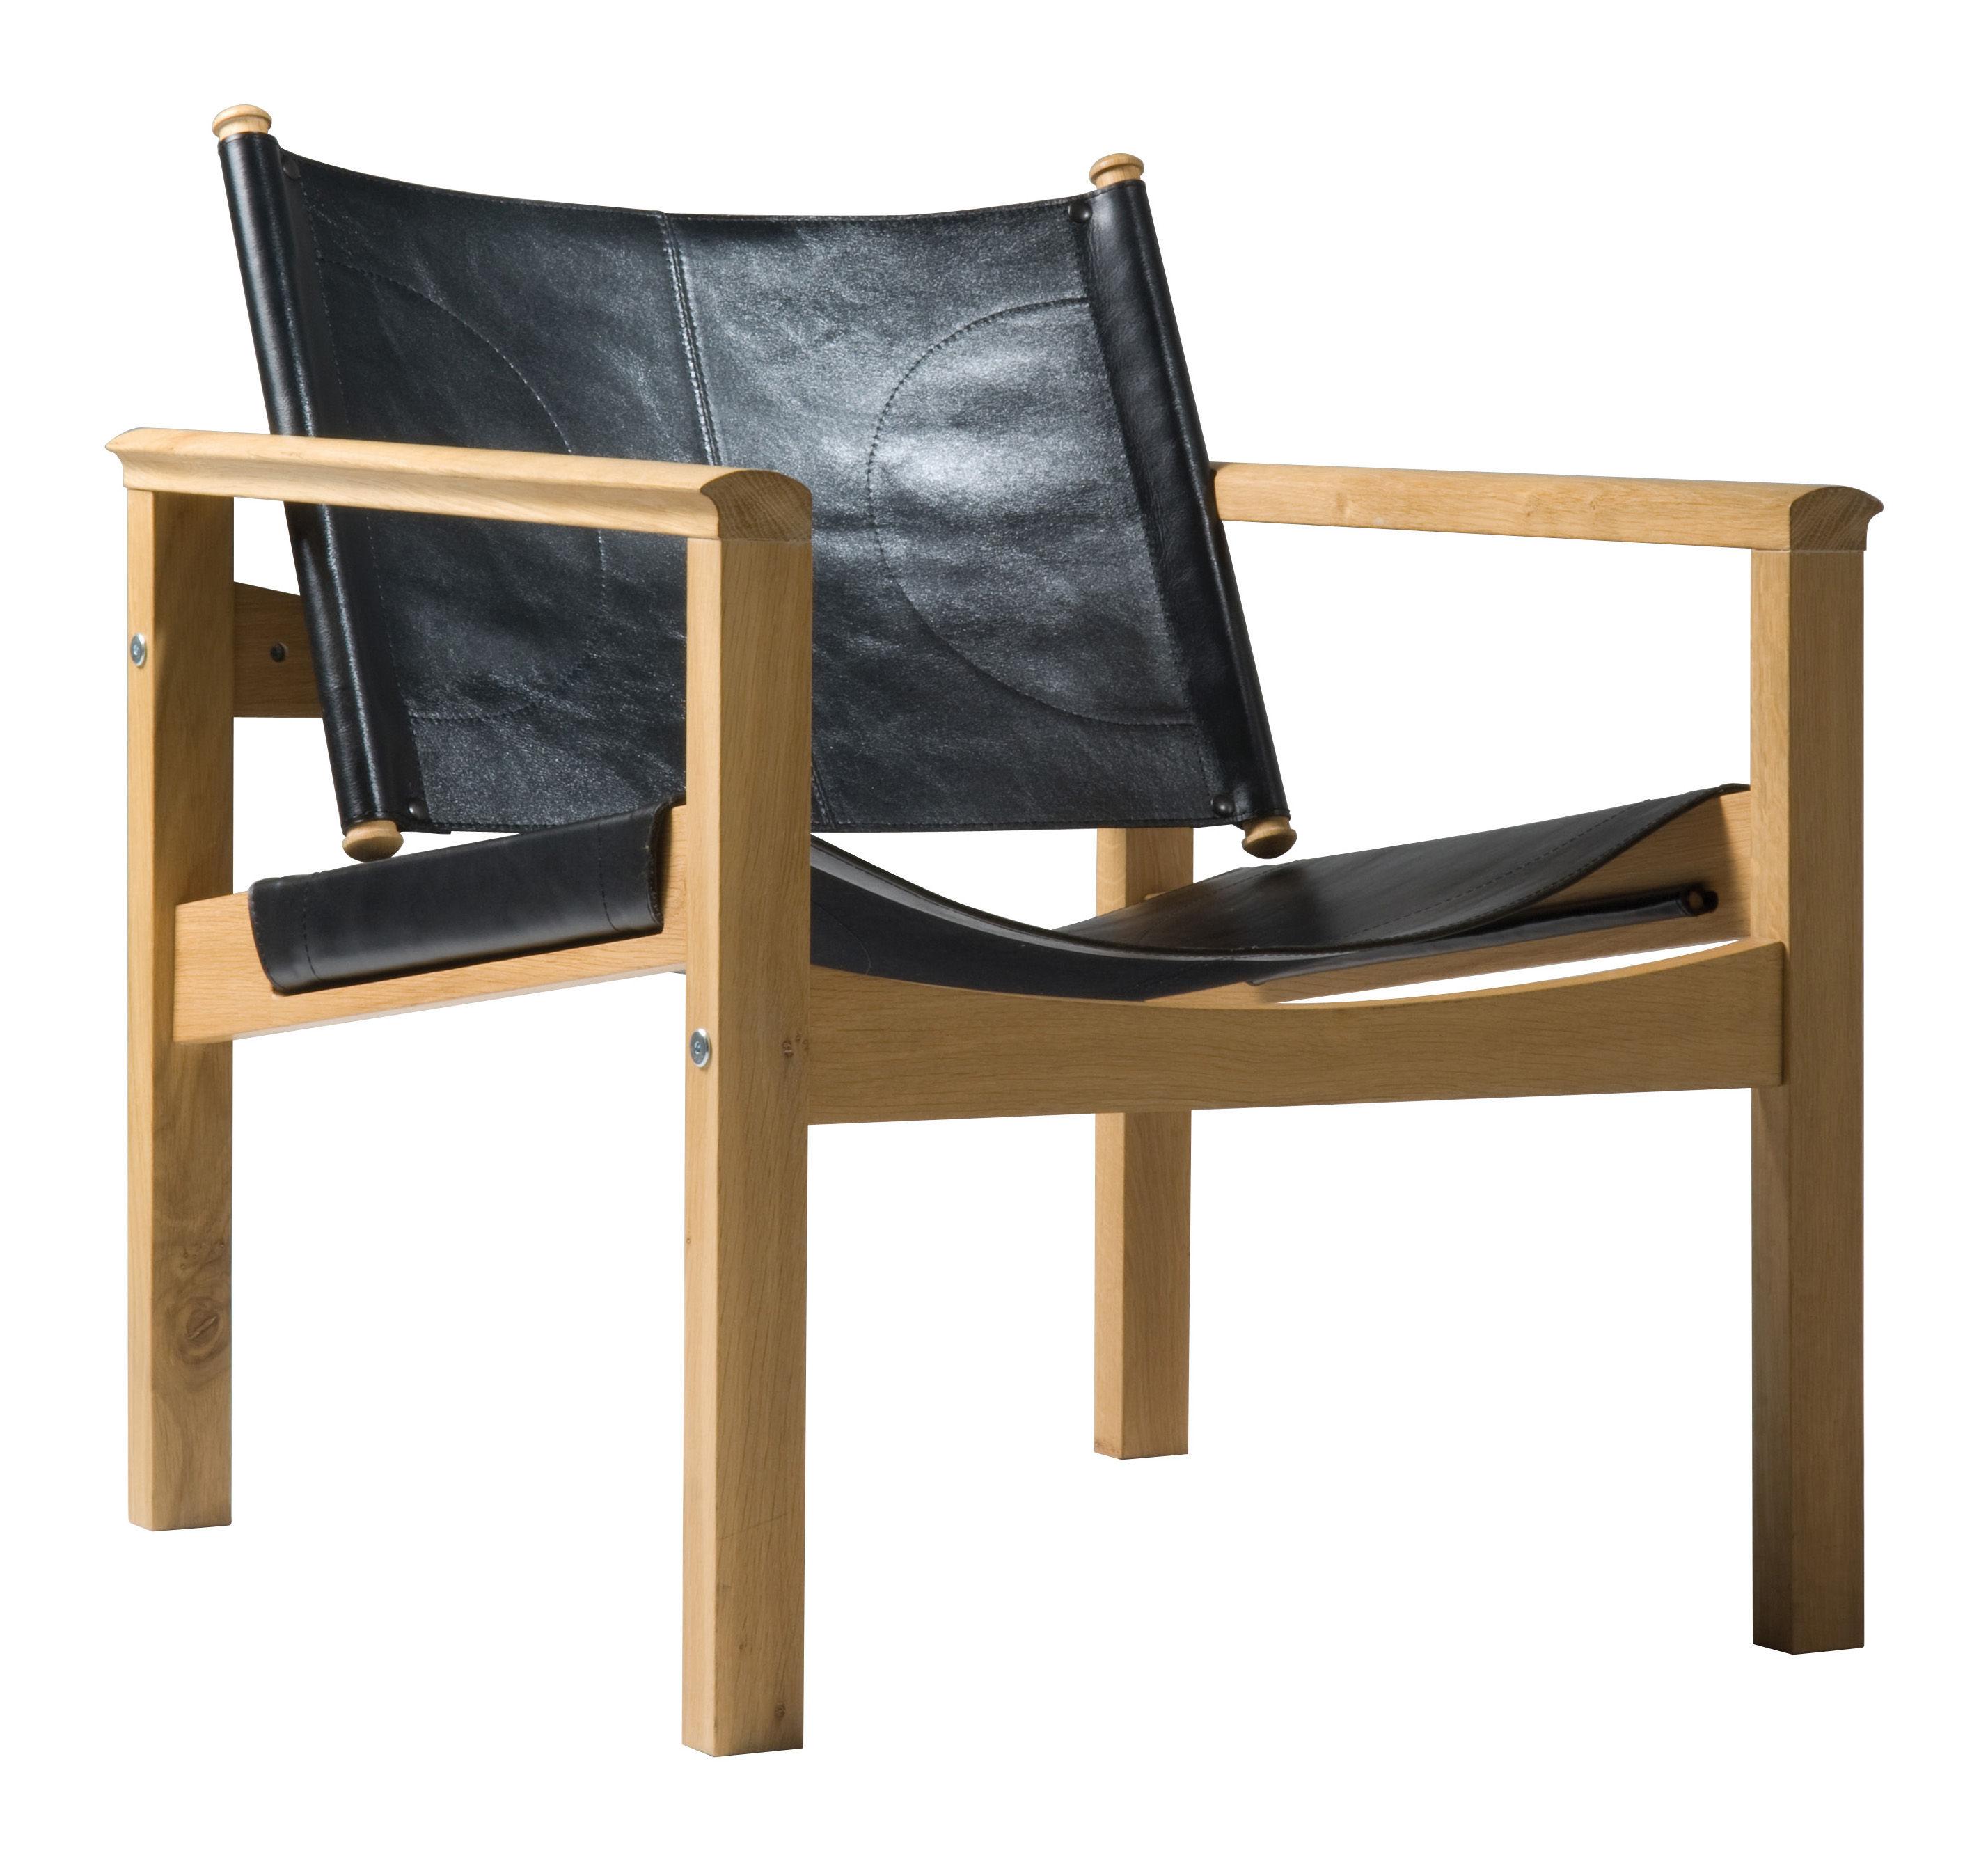 Möbel - Lounge Sessel - Peglev Sessel - Objekto - Korpus aus geölter Eiche / Lederbezug schwarz - Eiche, Leder